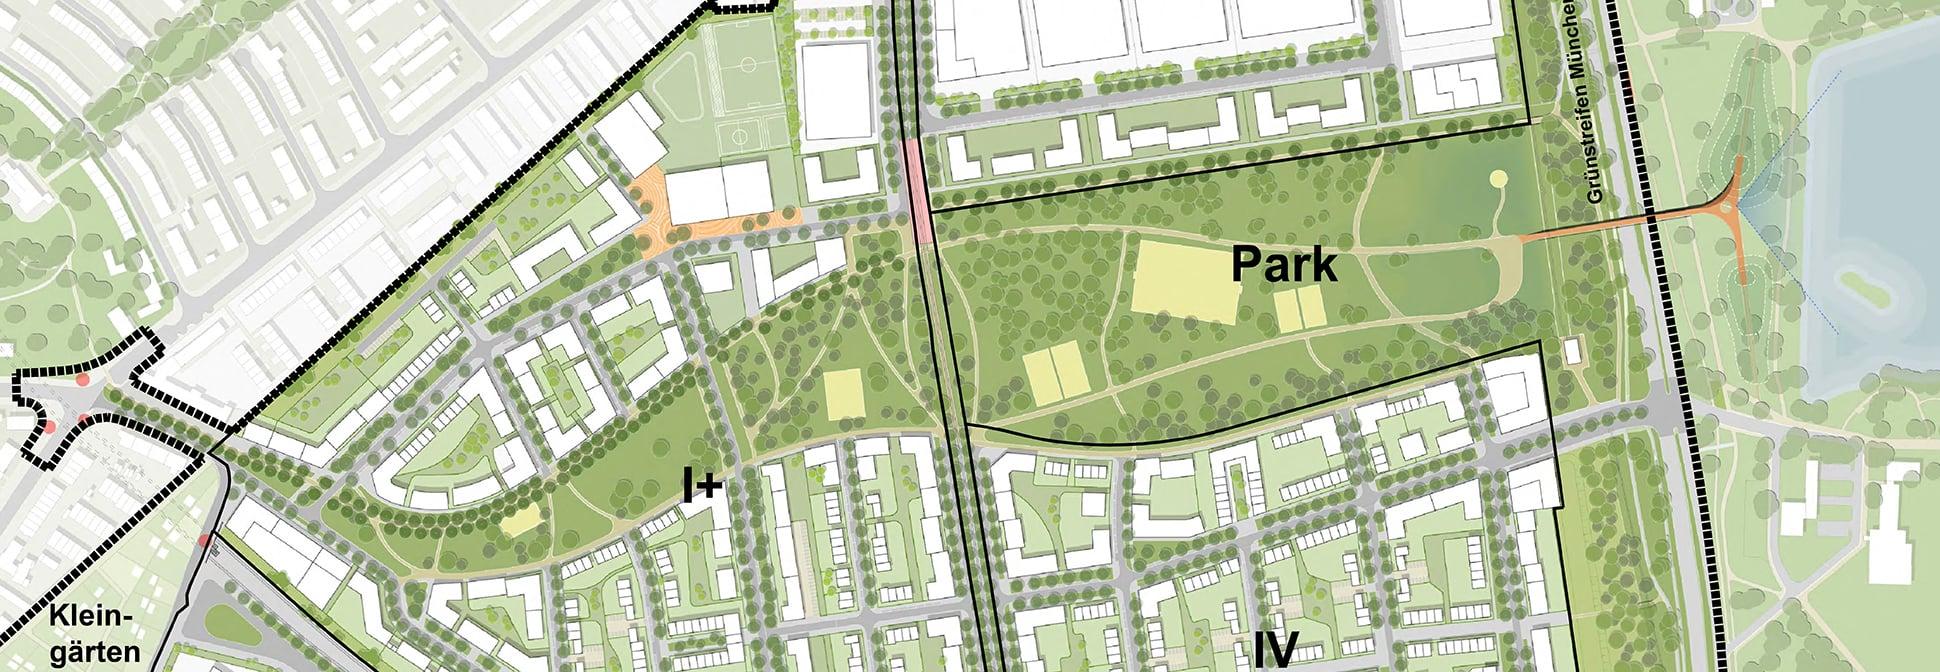 Grünordnungsplanung Nürnberg Lichtenreuth Zugang